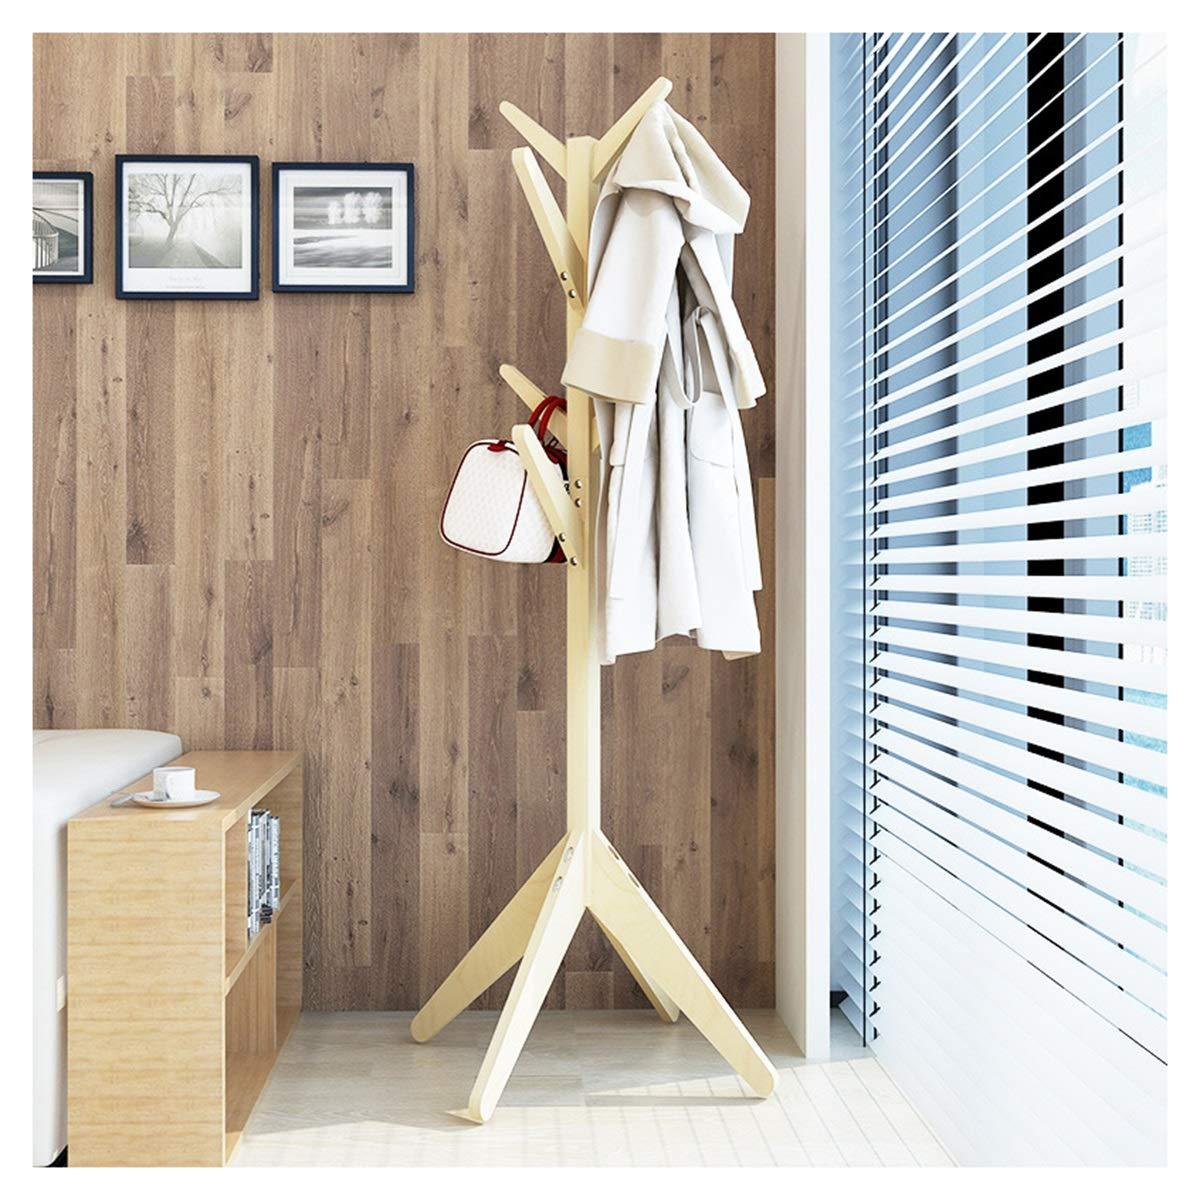 WPQW コートラック - 純木の創造的なハンガーの床の寝室のハンガーシンプルでシンプルなシンプルなハンギングラック - コート ハンガー 2088 (Color : B) B07TCY6FK2 B